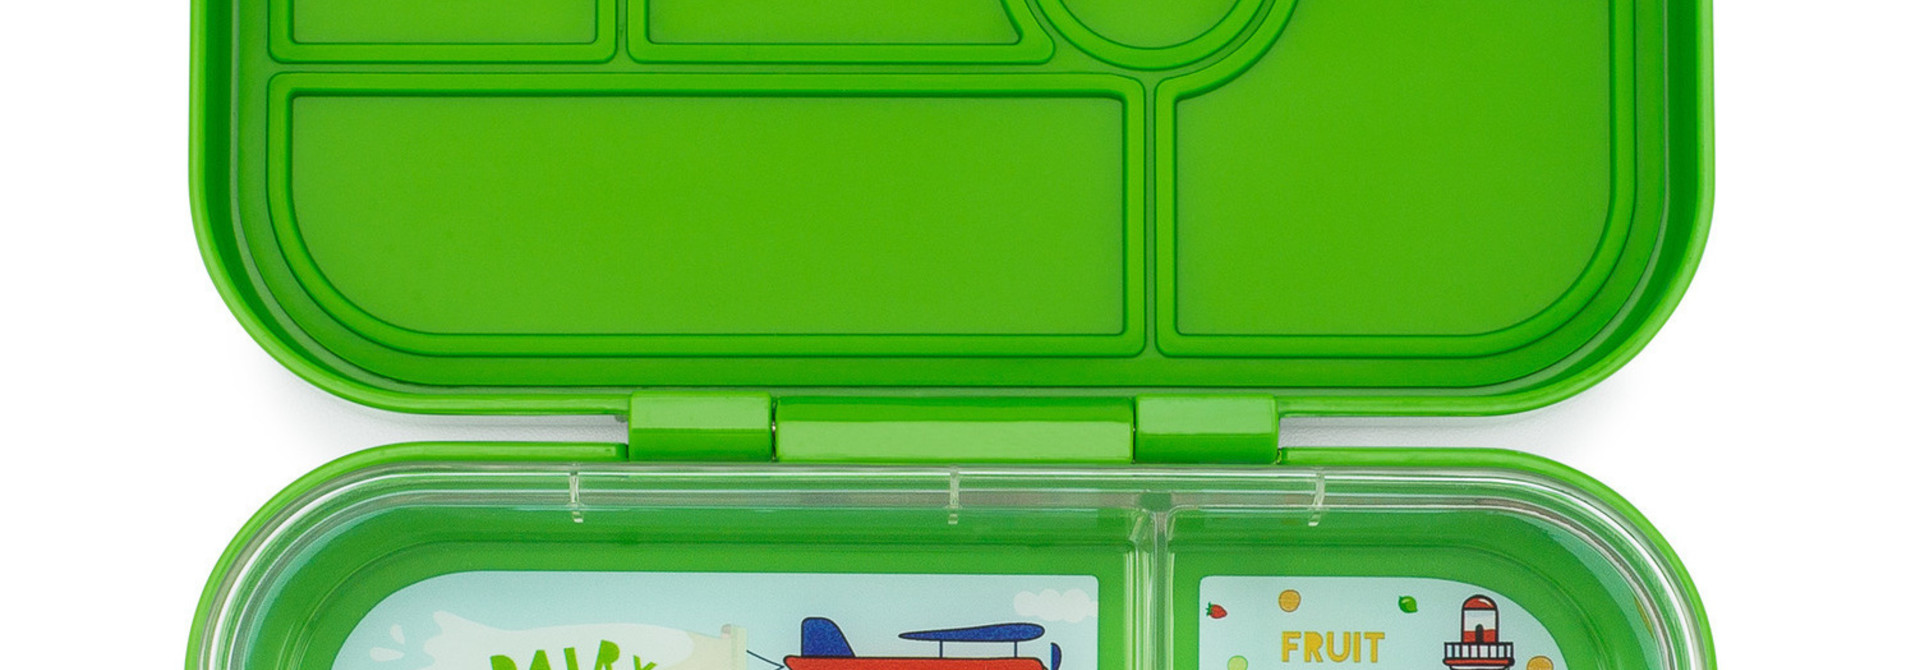 Yumbox Original broodtrommel 6 vakken, Cilantro groen / Explore tray